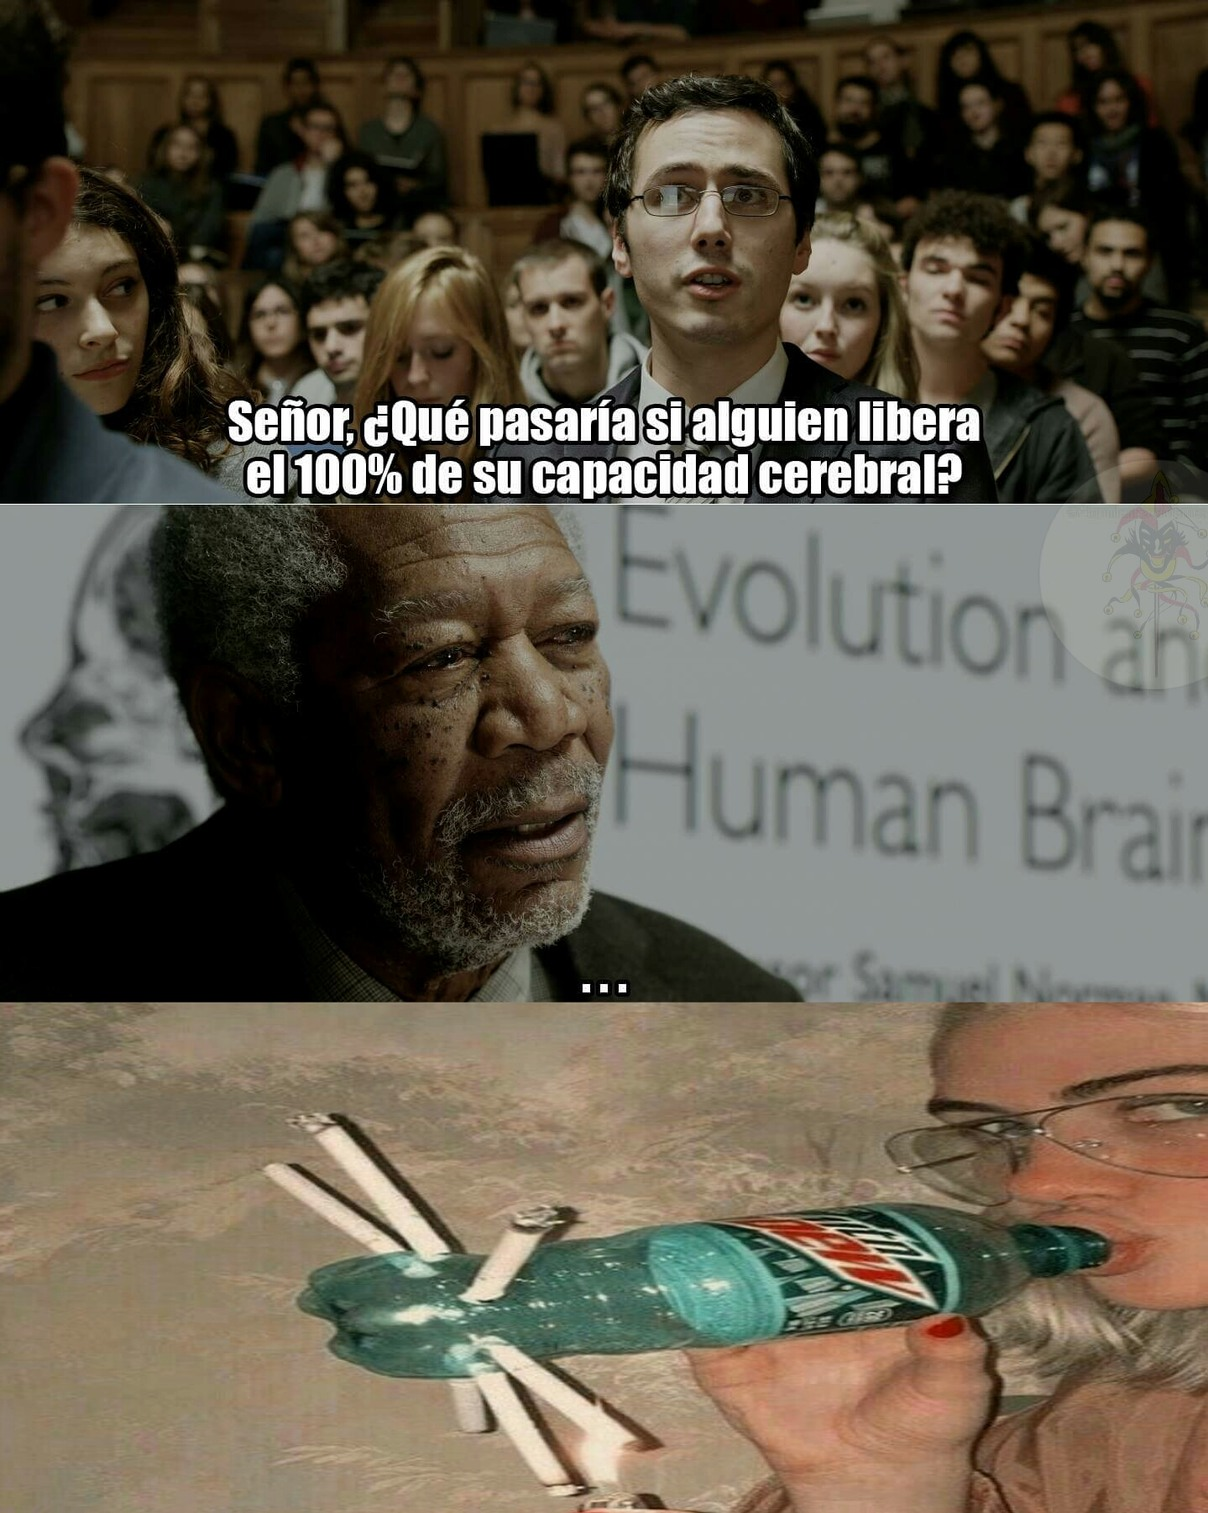 Inteligente ¿no? - meme